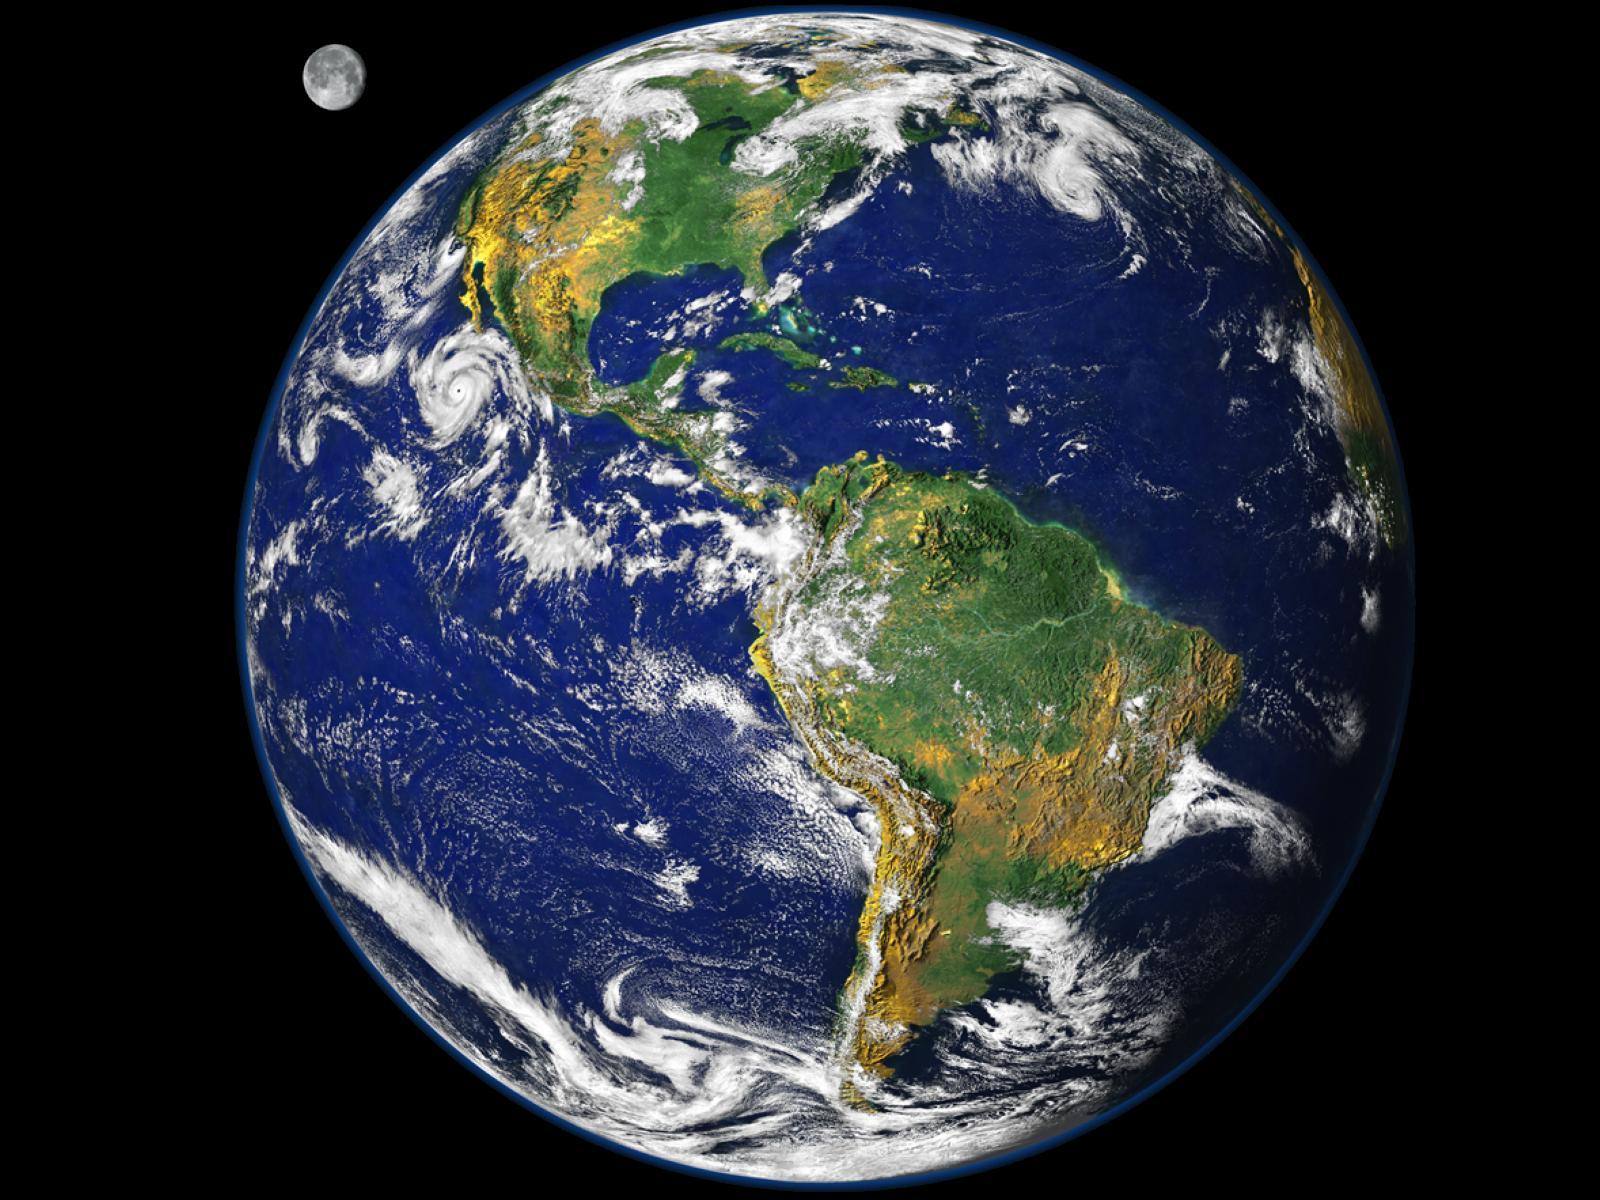 terra mundial: